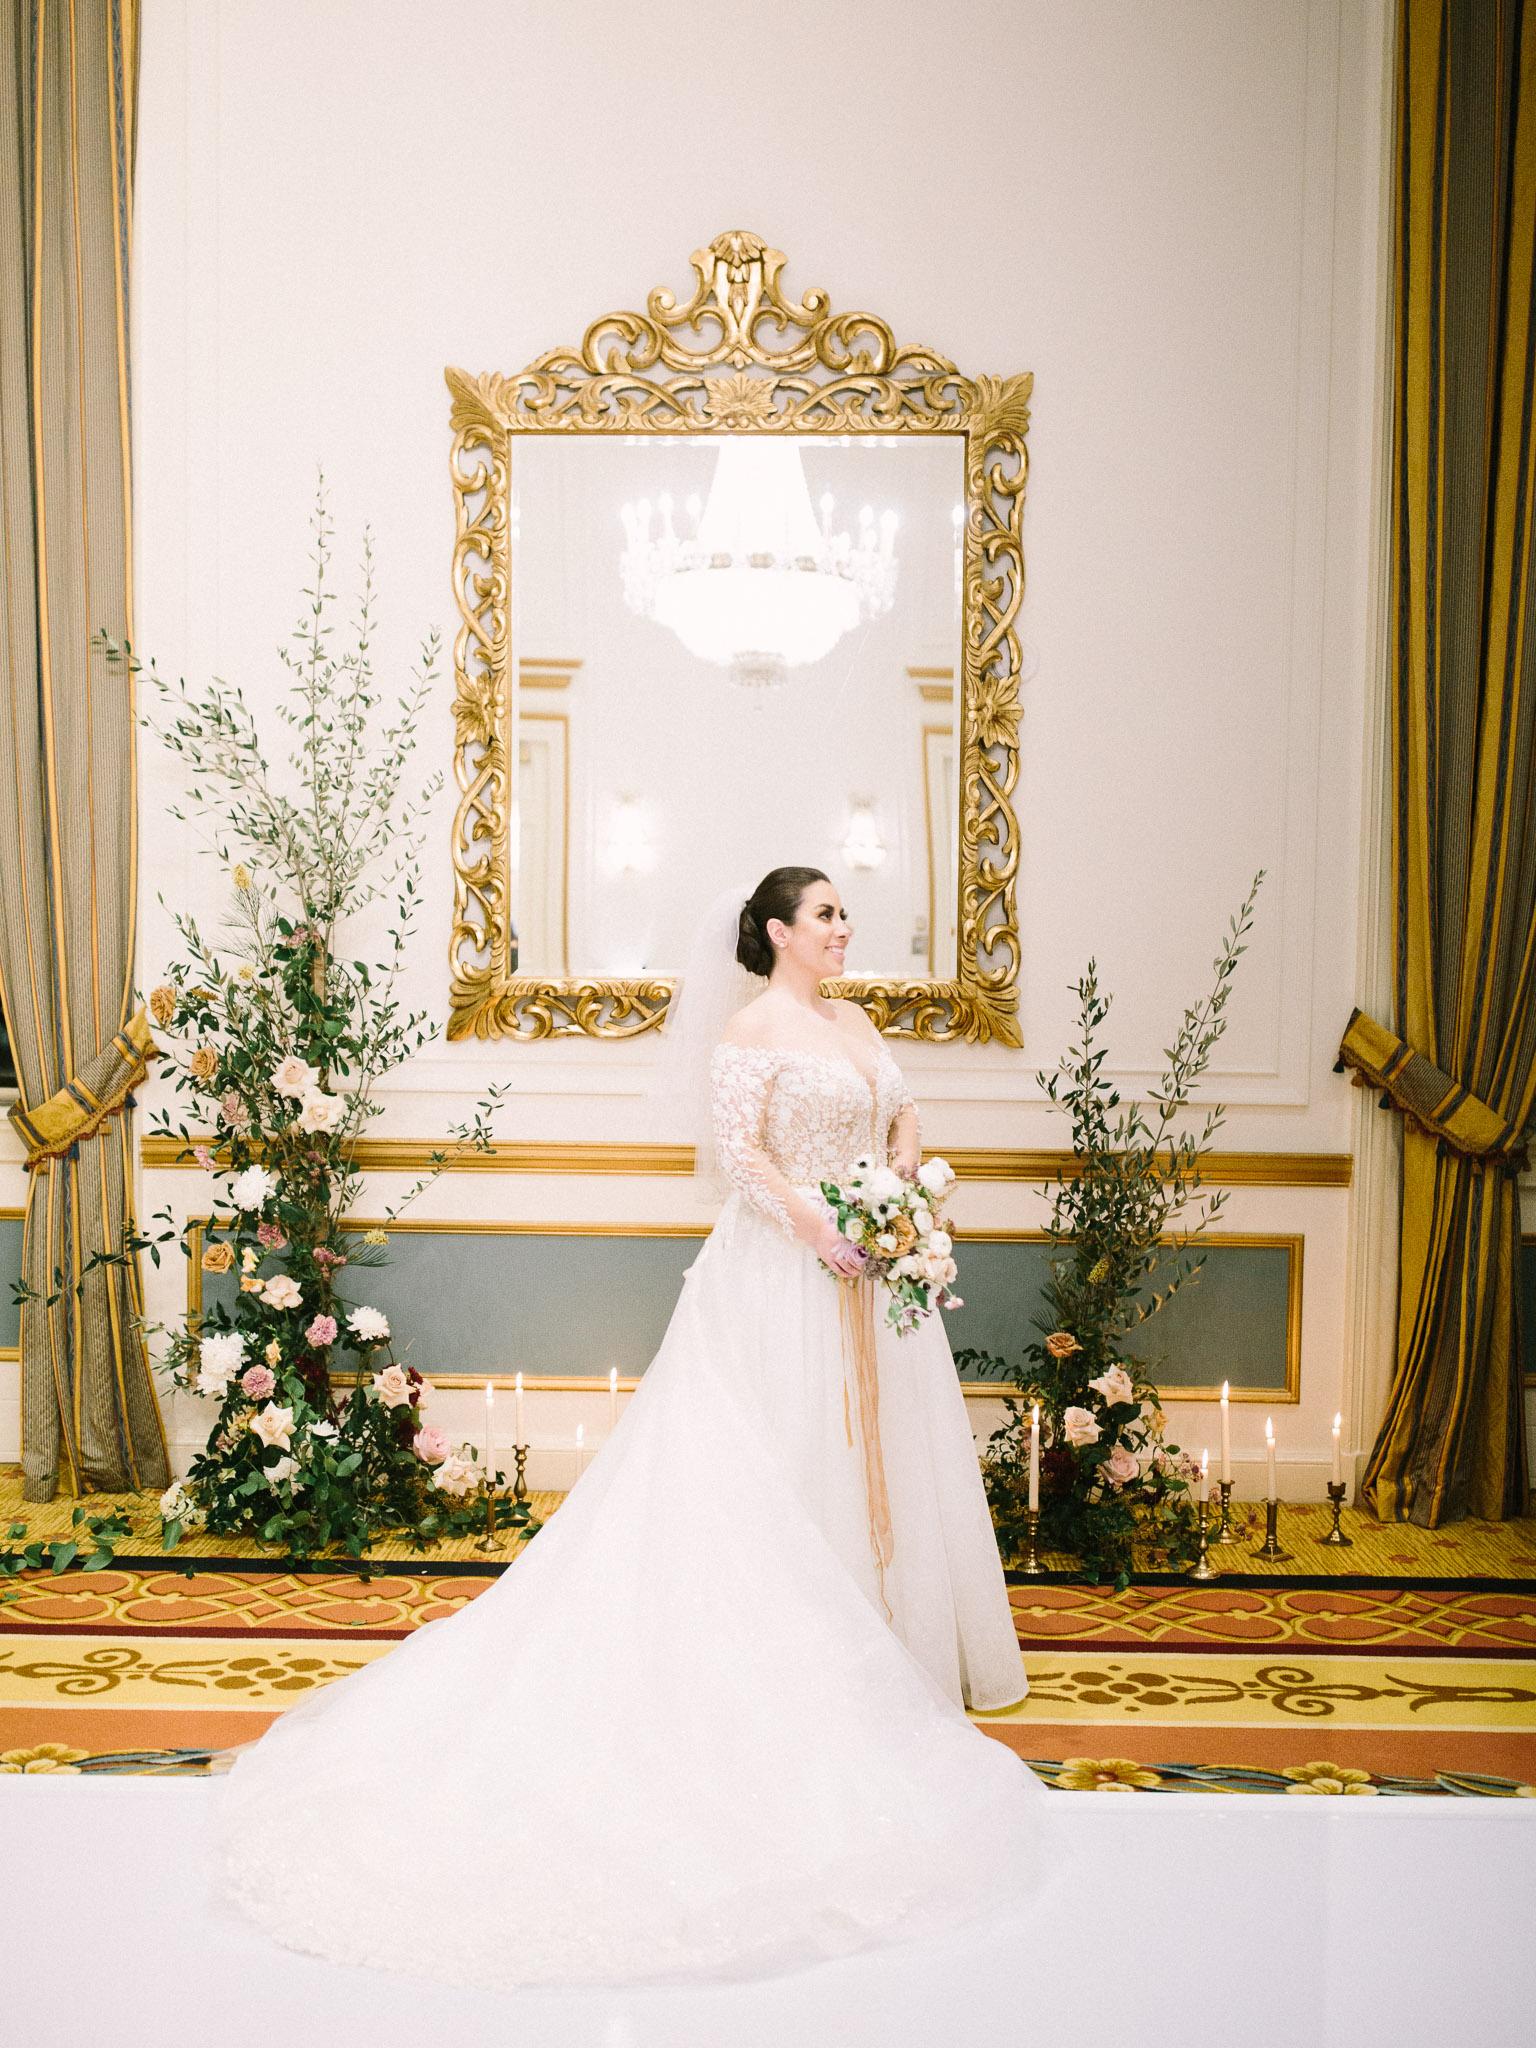 Hanna&Jordan Wedding_HotelVancouver_9391.jpg